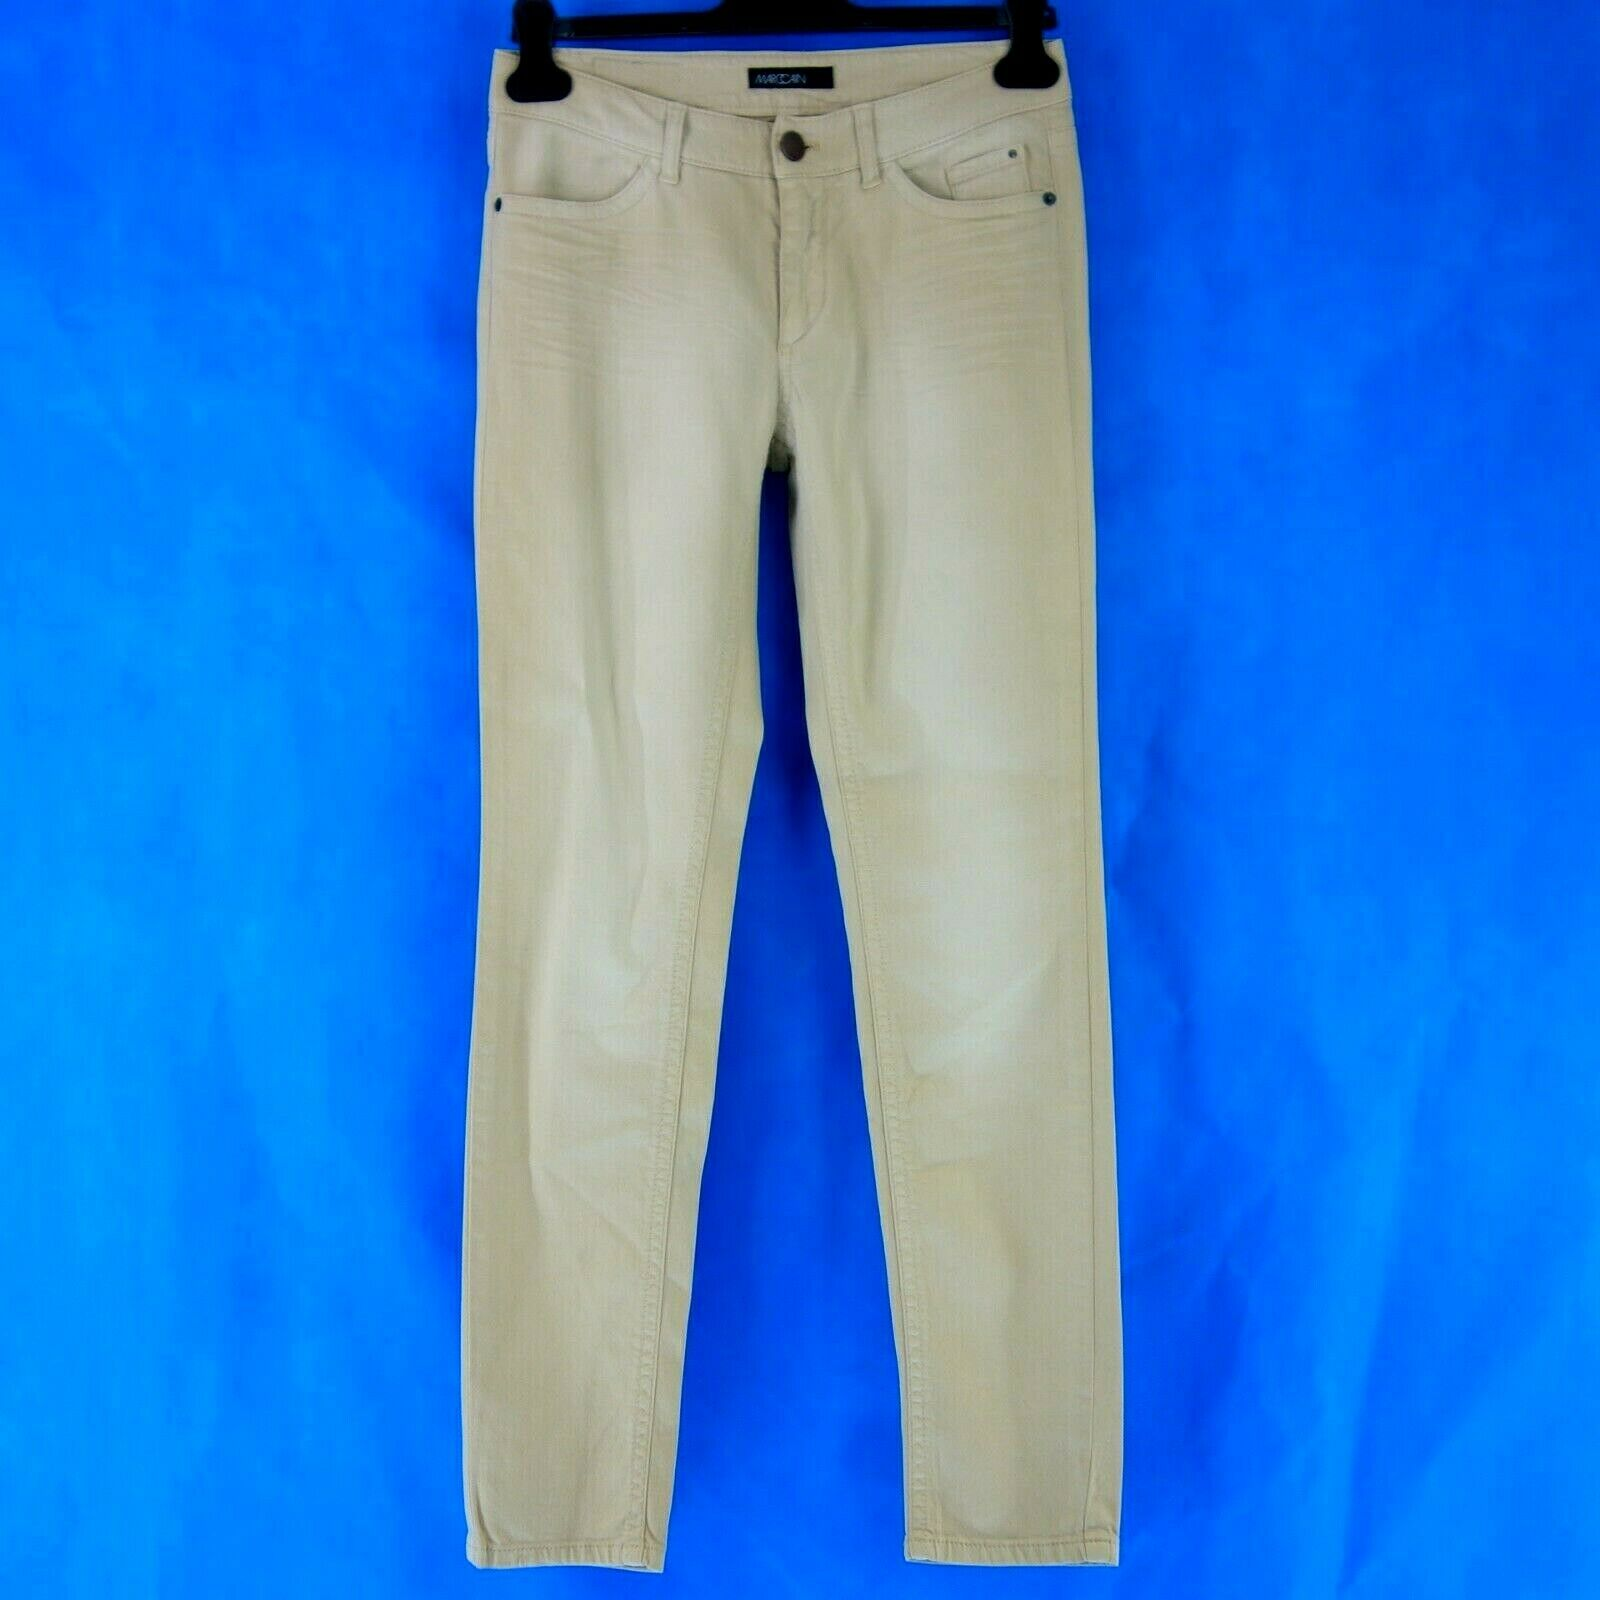 MARC CAIN Damen Jeans Hose FC8277 N1 N3 34 38 Skinny Mid Rise Denim NP 189 NEU